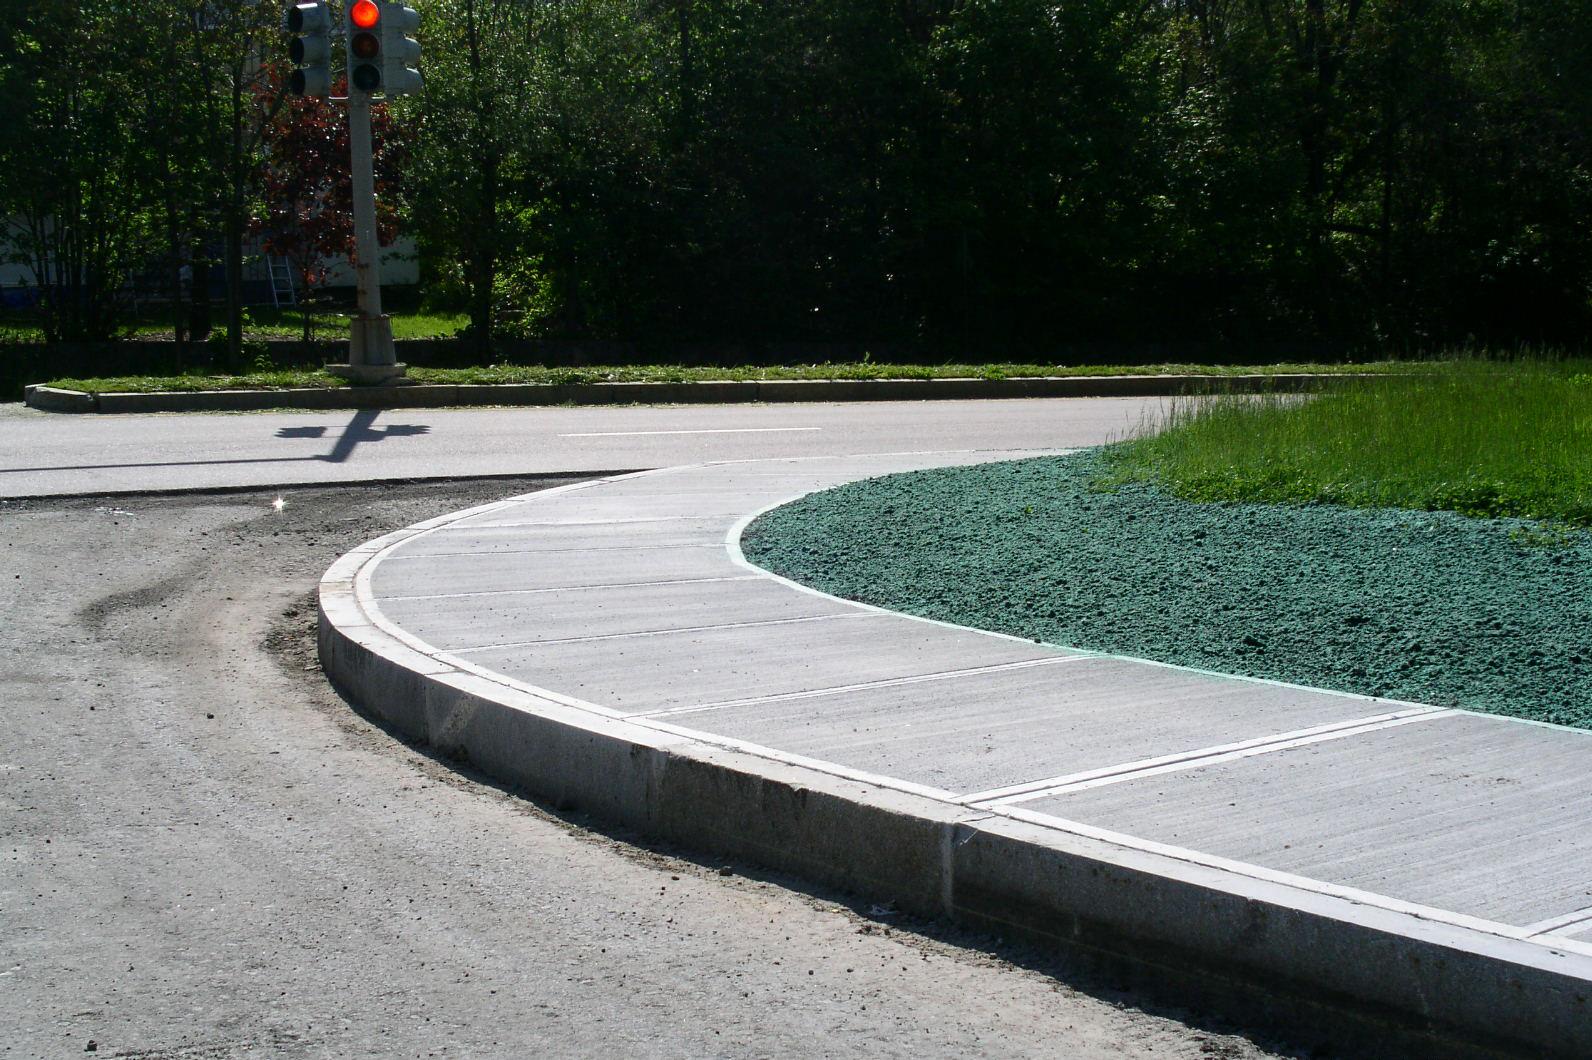 Sidewalks_image001.jpg